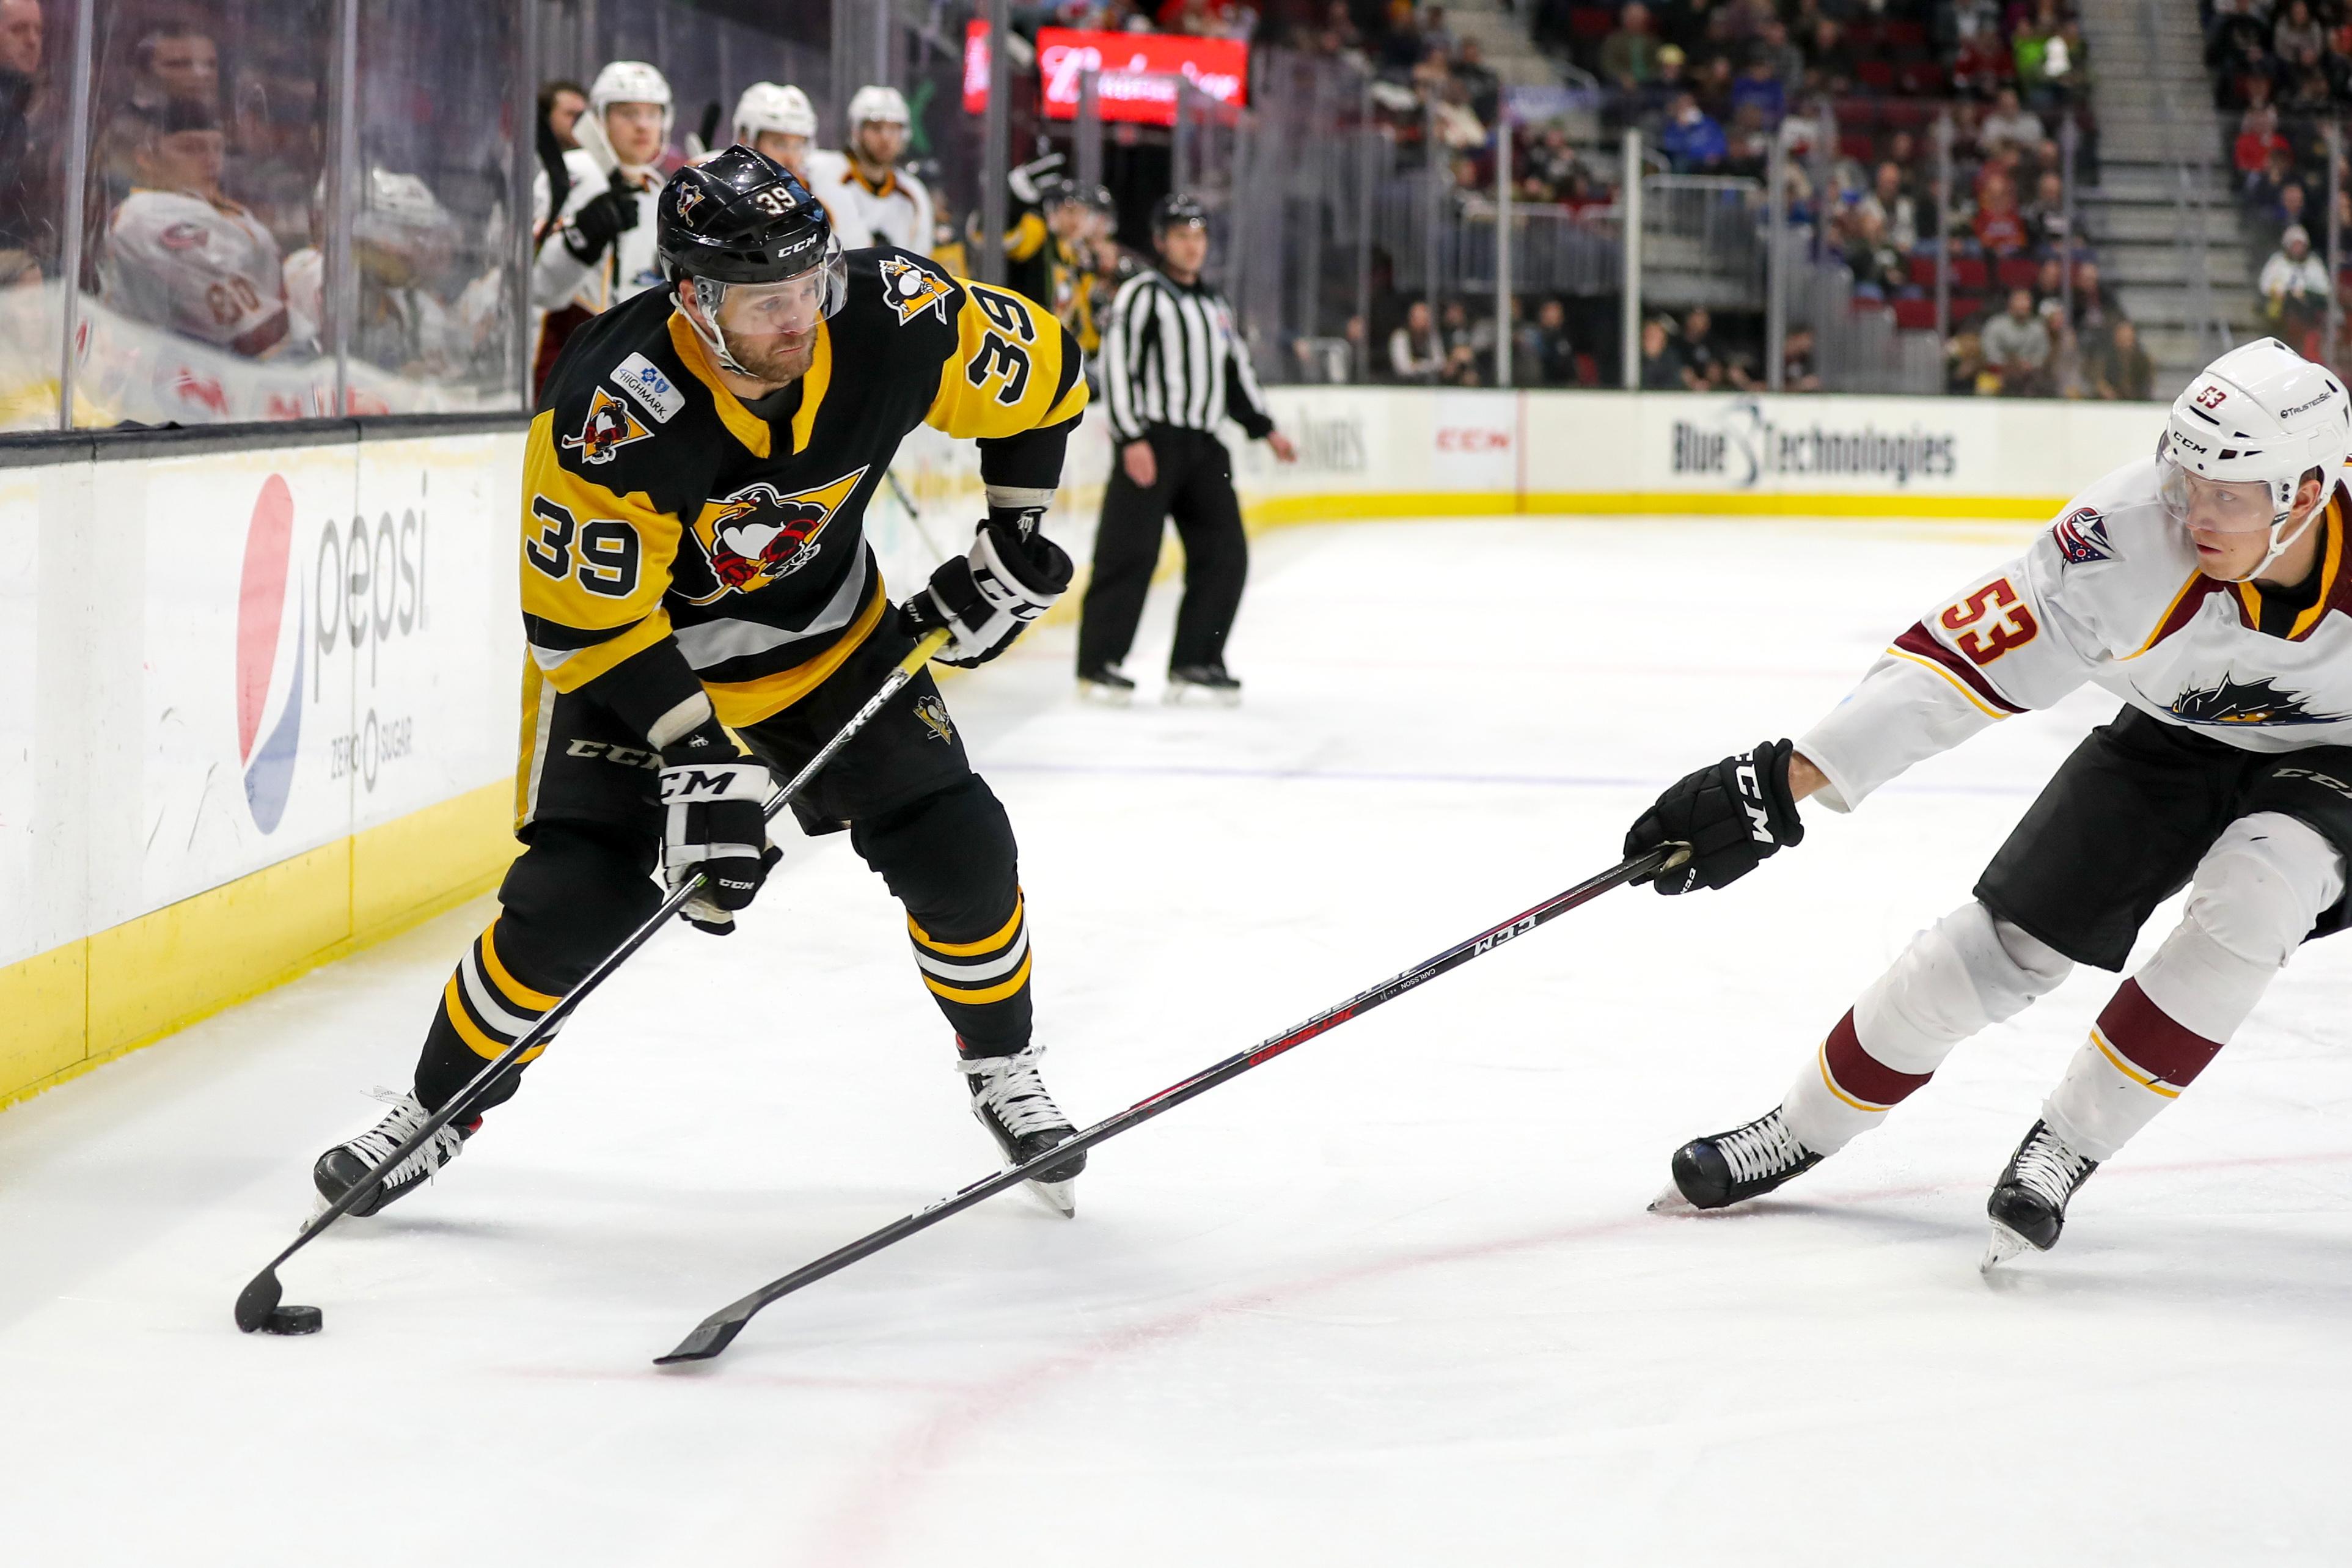 AHL: DEC 13 Wilkes-Barre/Scranton Penguins at Cleveland Monsters